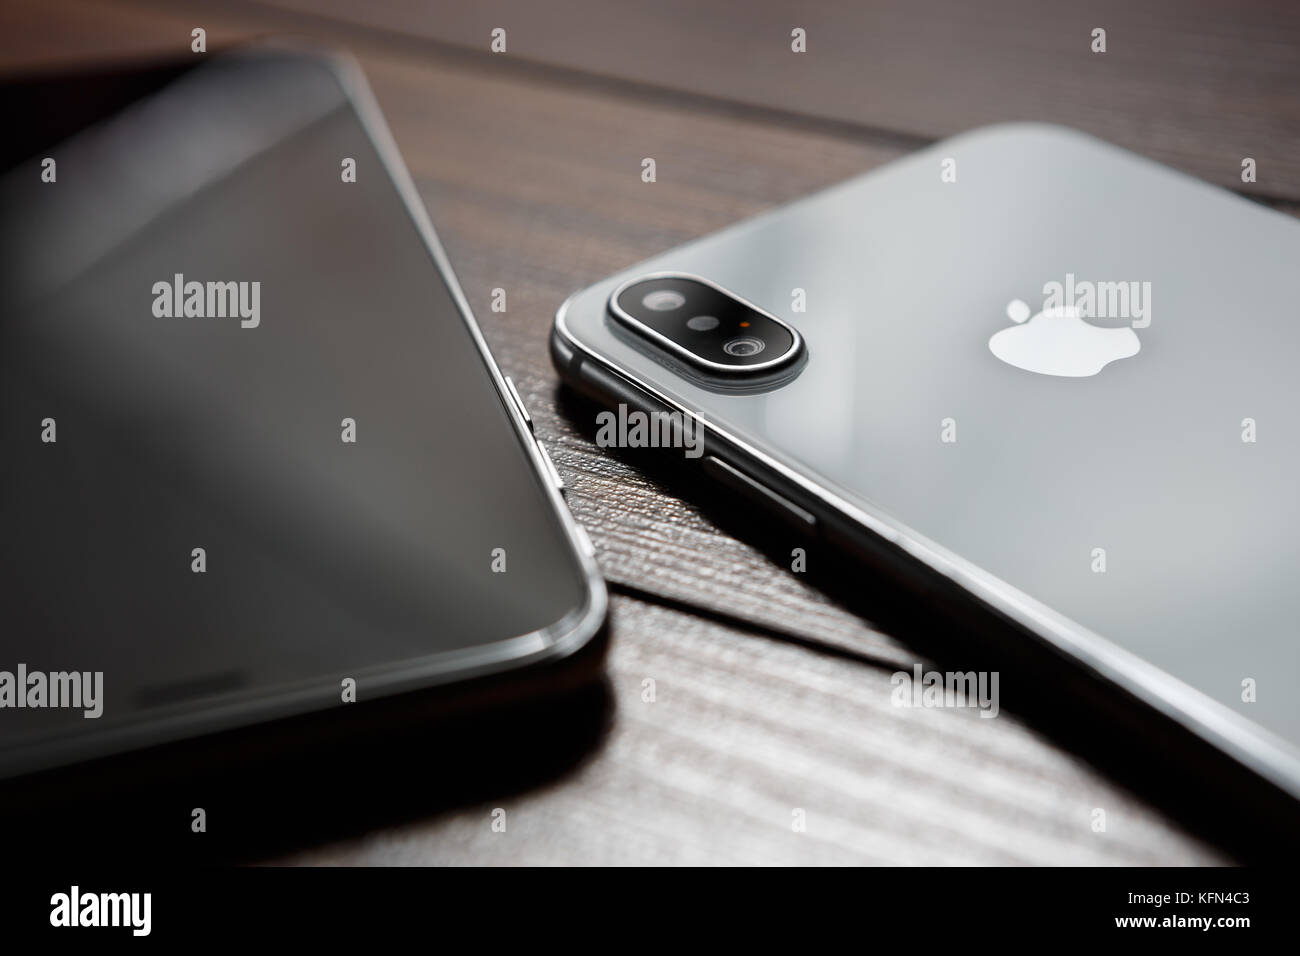 MARIUPOL,UKRAINE-30 OCTOBER,2017: New Iphone X smart phone in close up.Latest Apple Iphone 10 mobile phone model.Illustrative - Stock Image